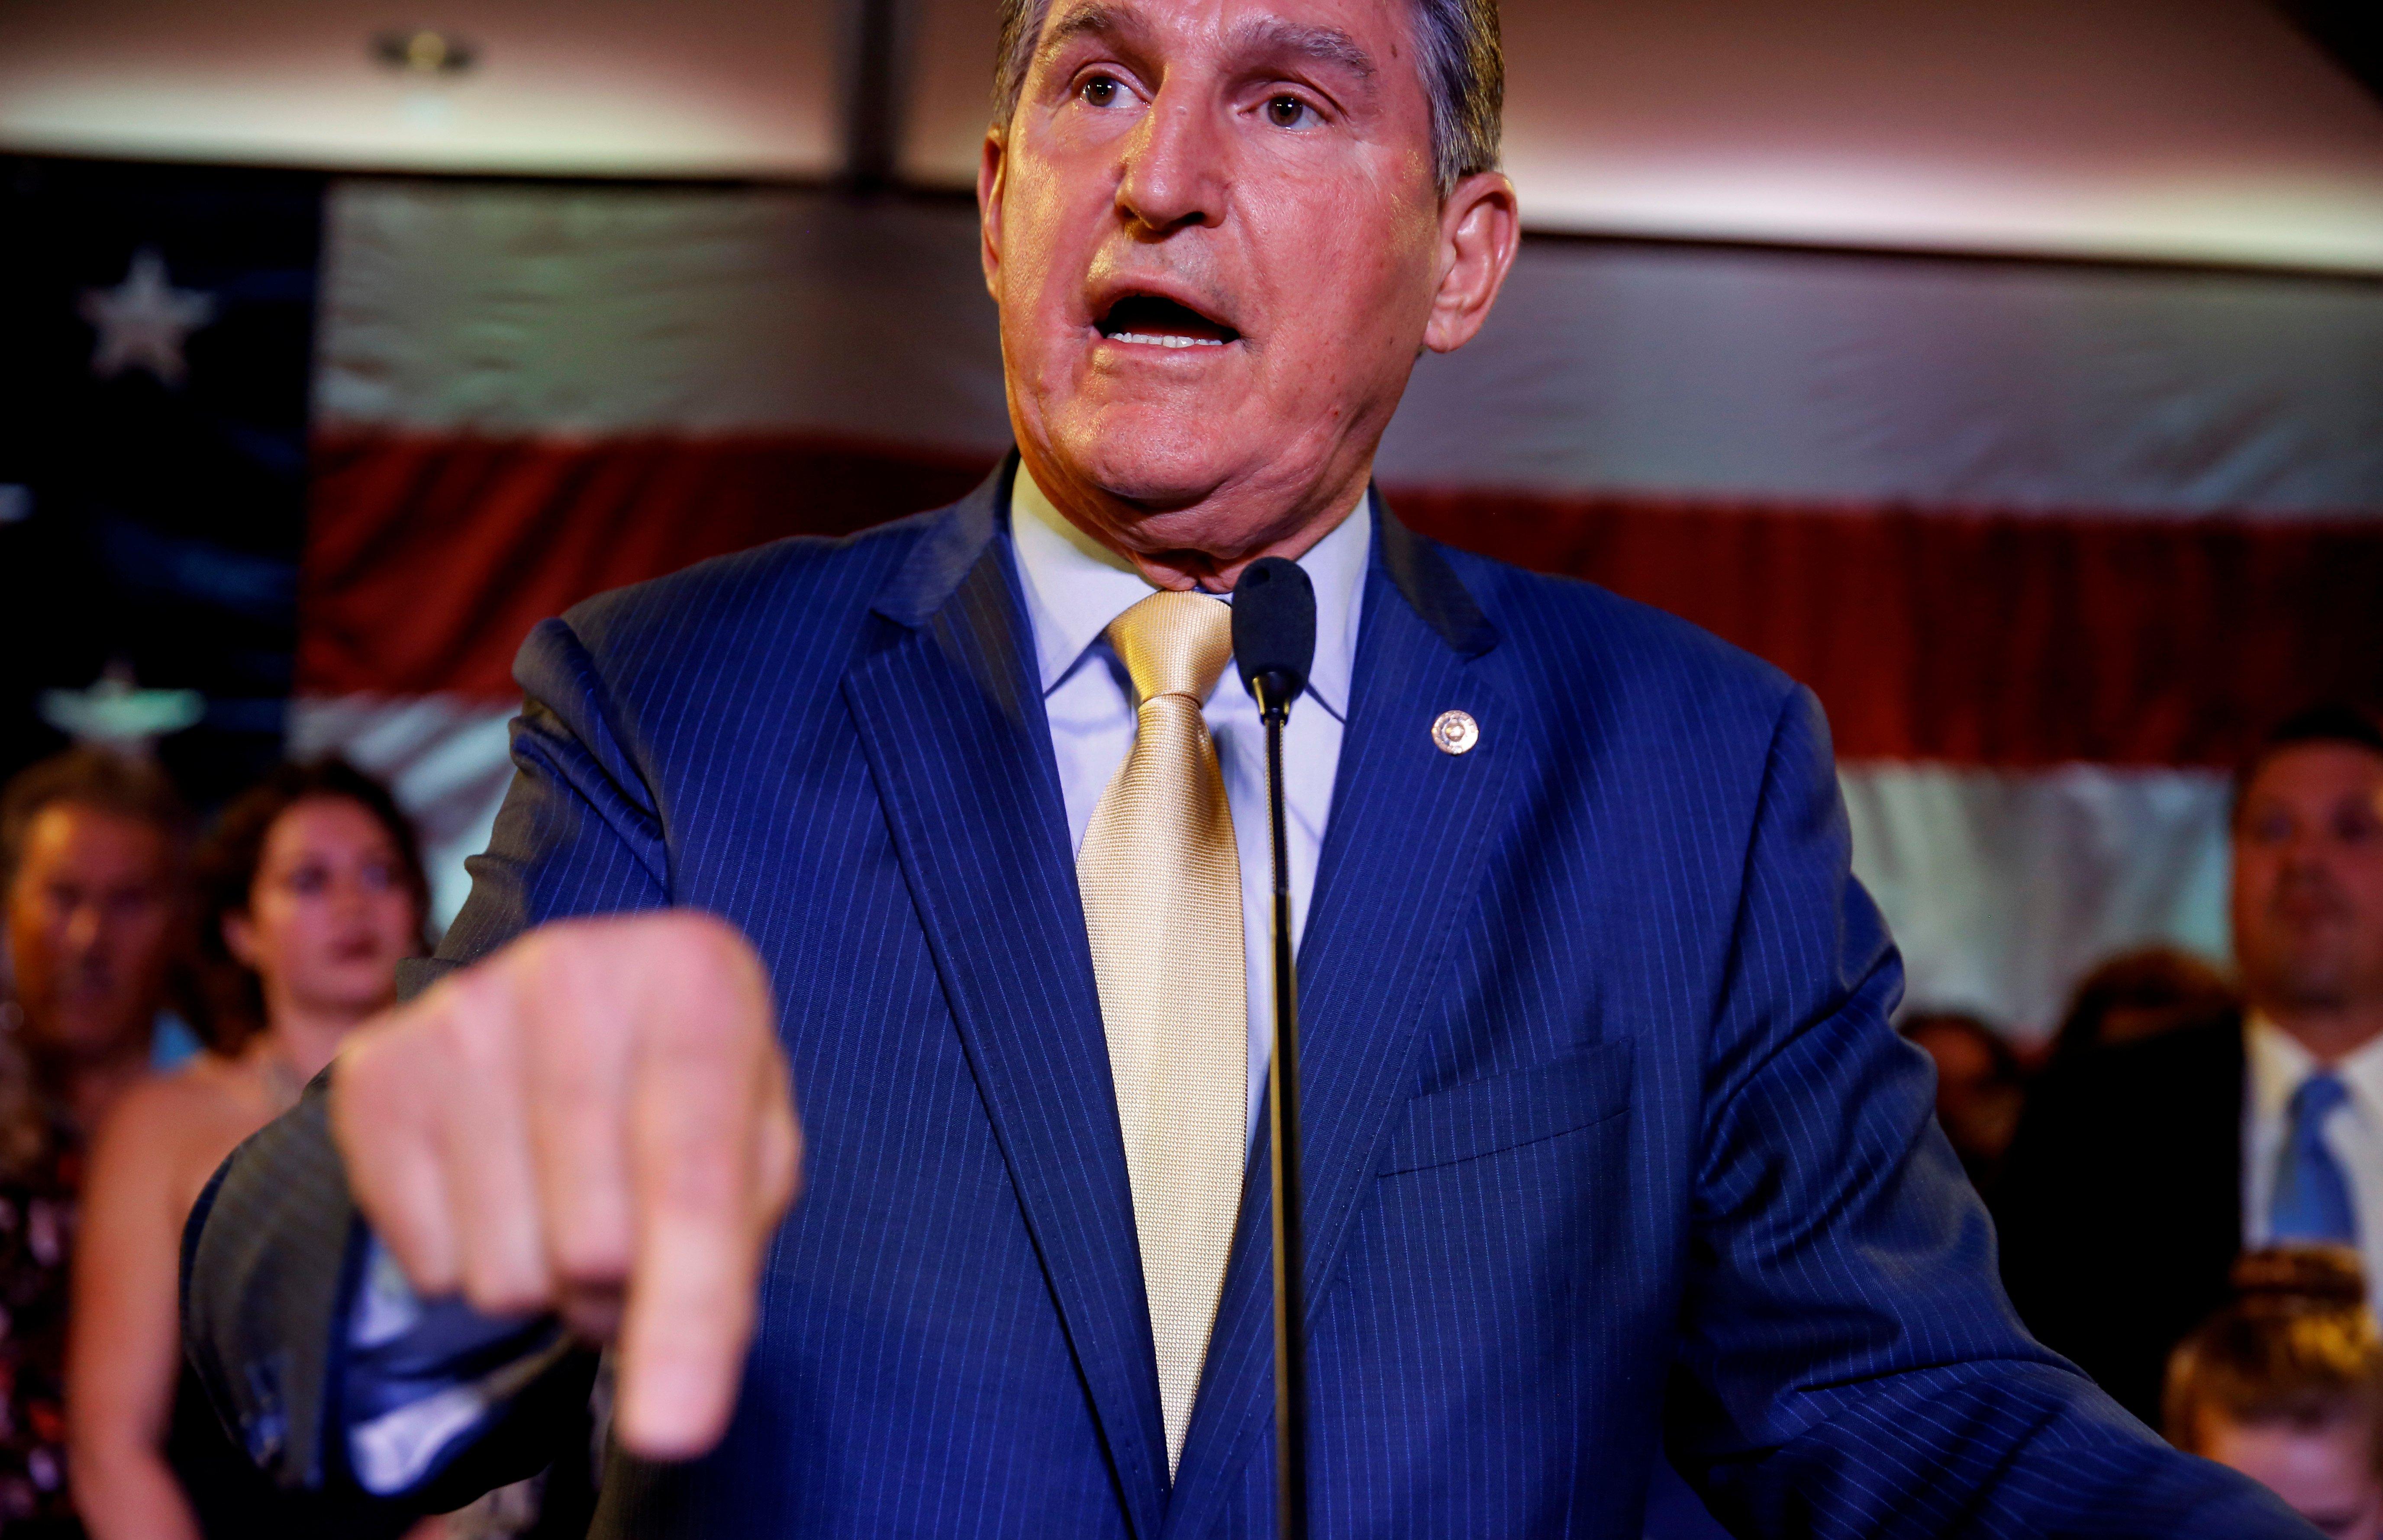 Democratic Senator Joe Manchin speaks after winning his 2018 midterm election in Charlestown, West Virginia, U.S., November 6, 2018. REUTERS/Joshua Roberts